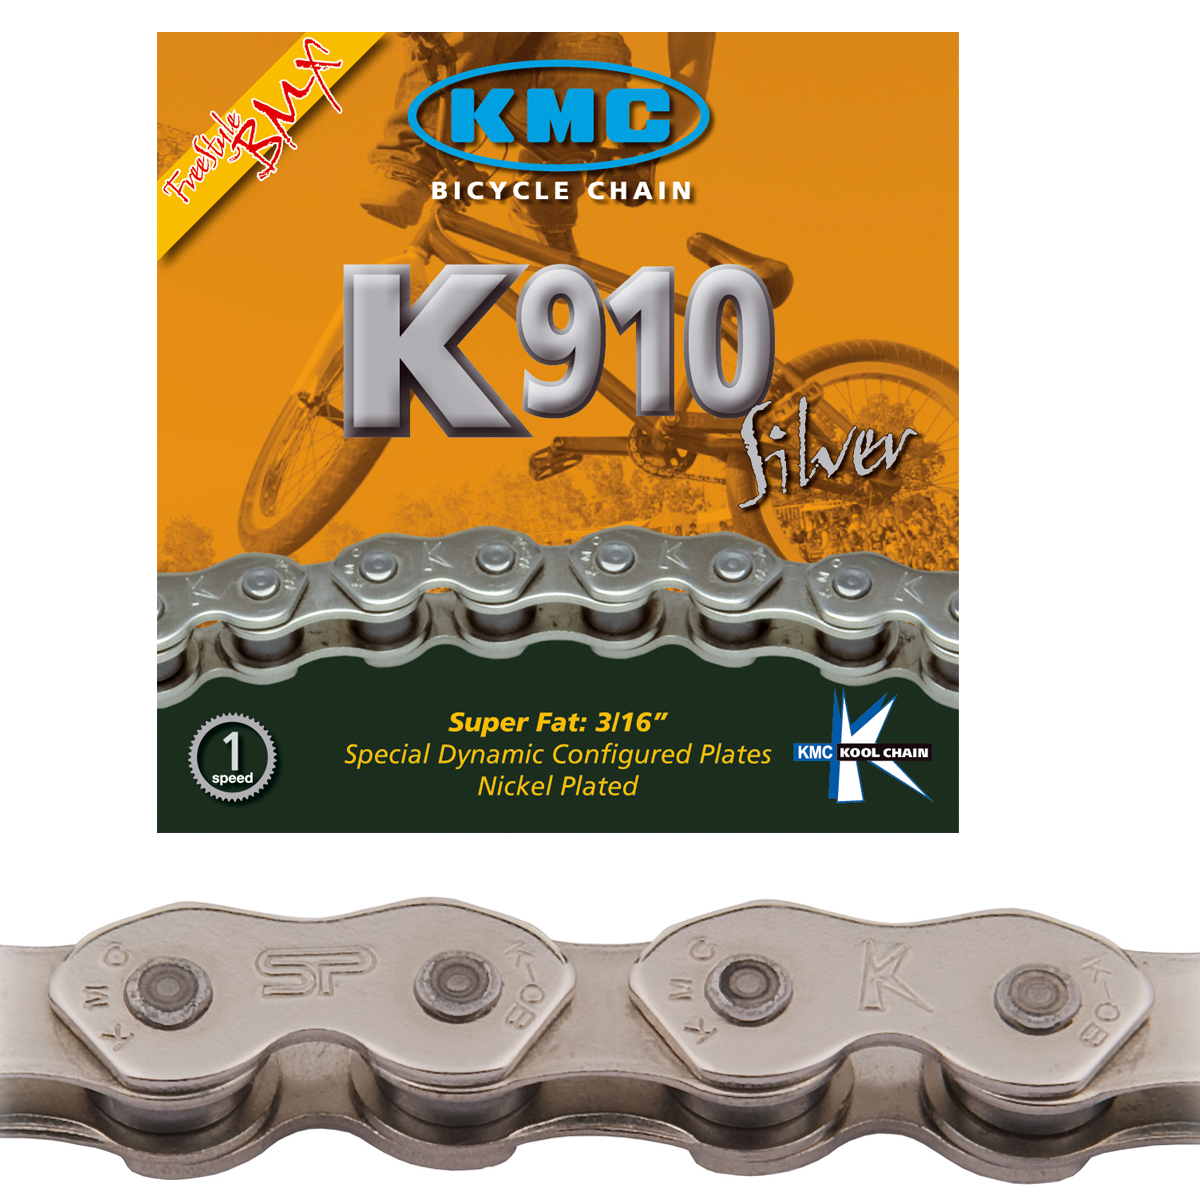 Chaîne KMC BMX K910 Silver Kool Series